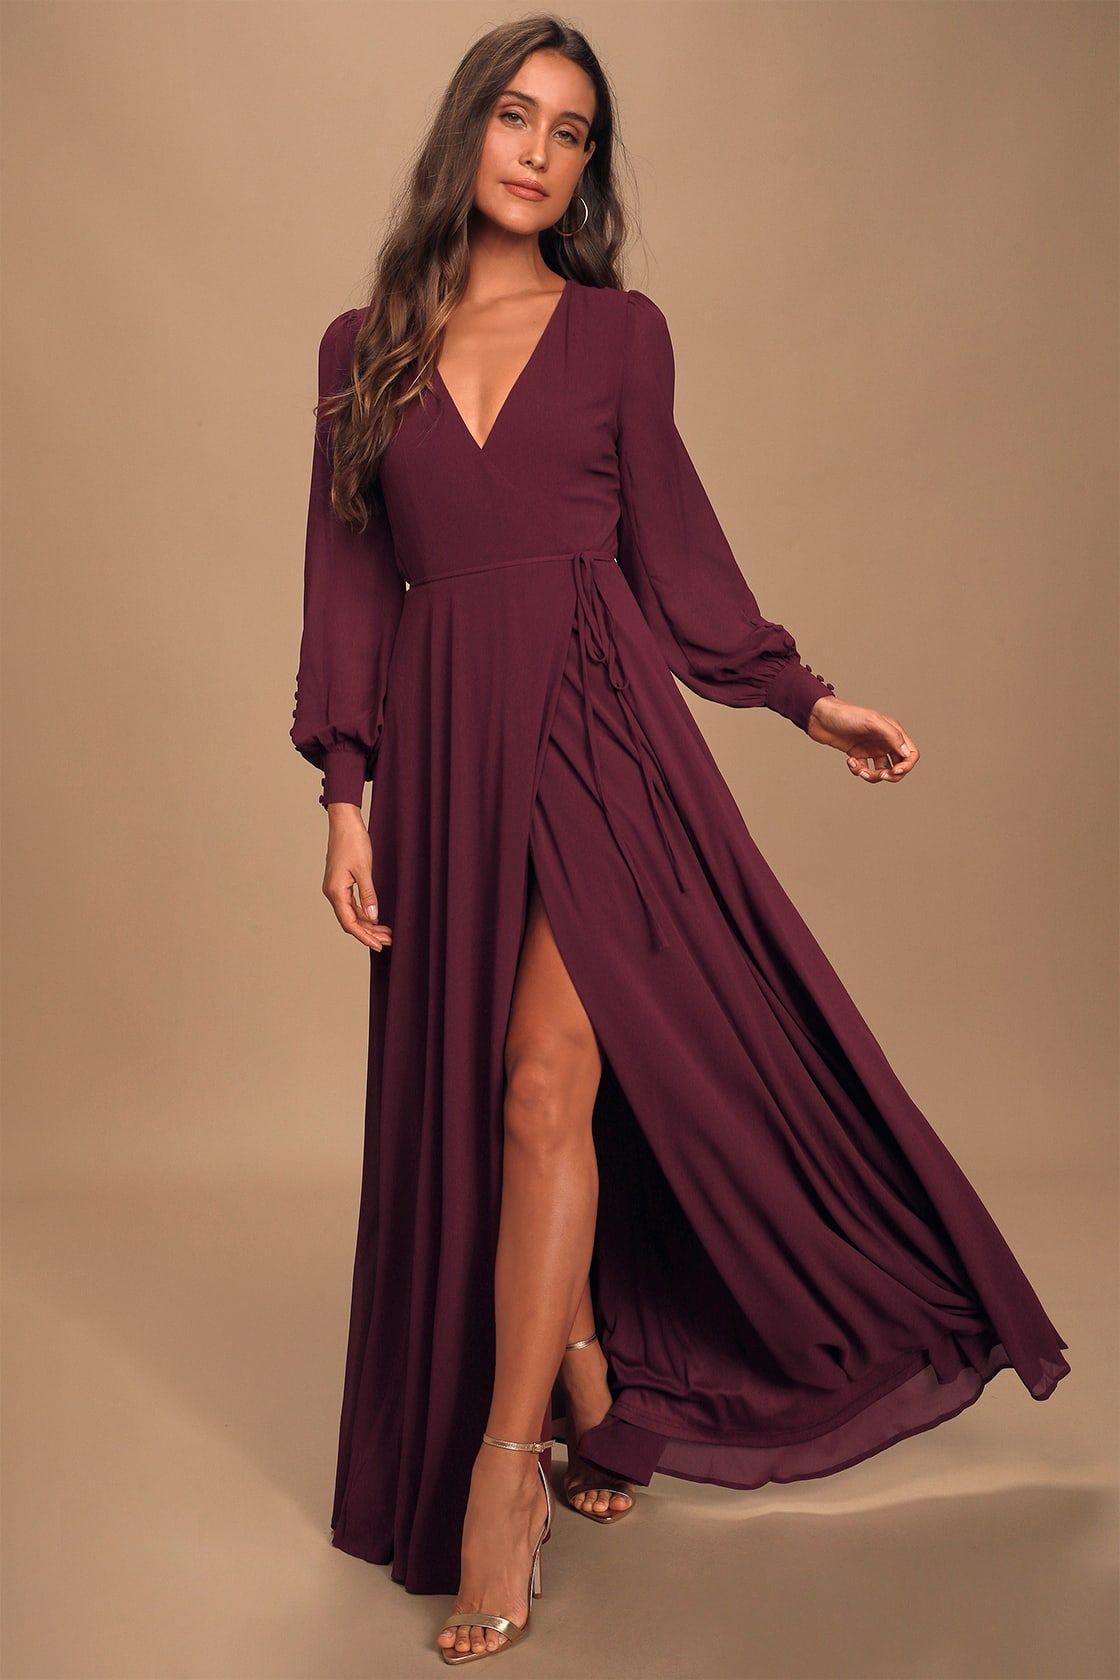 My Whole Heart Plum Long Sleeve Wrap Dress Wrap Maxi Dress Long Sleeve Long Sleeve Wrap Dress Long Sleeve Bridesmaid Dress [ 1680 x 1120 Pixel ]